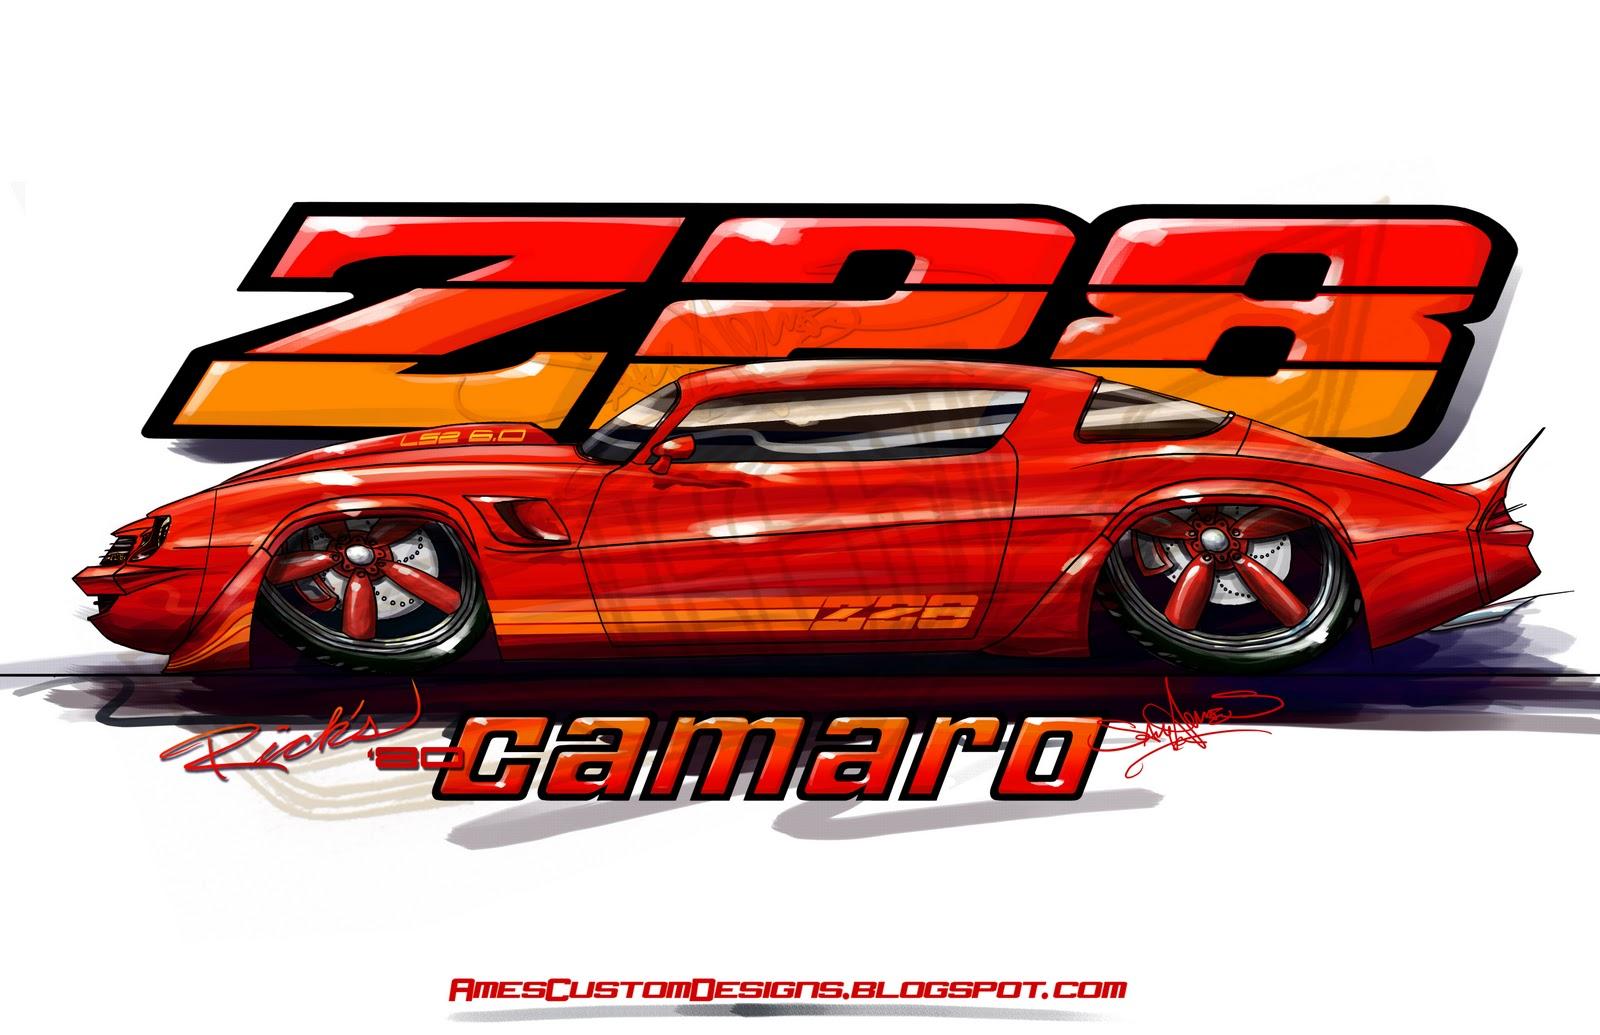 1979 Camaro For Sale Camaros And Firebirds For Sale